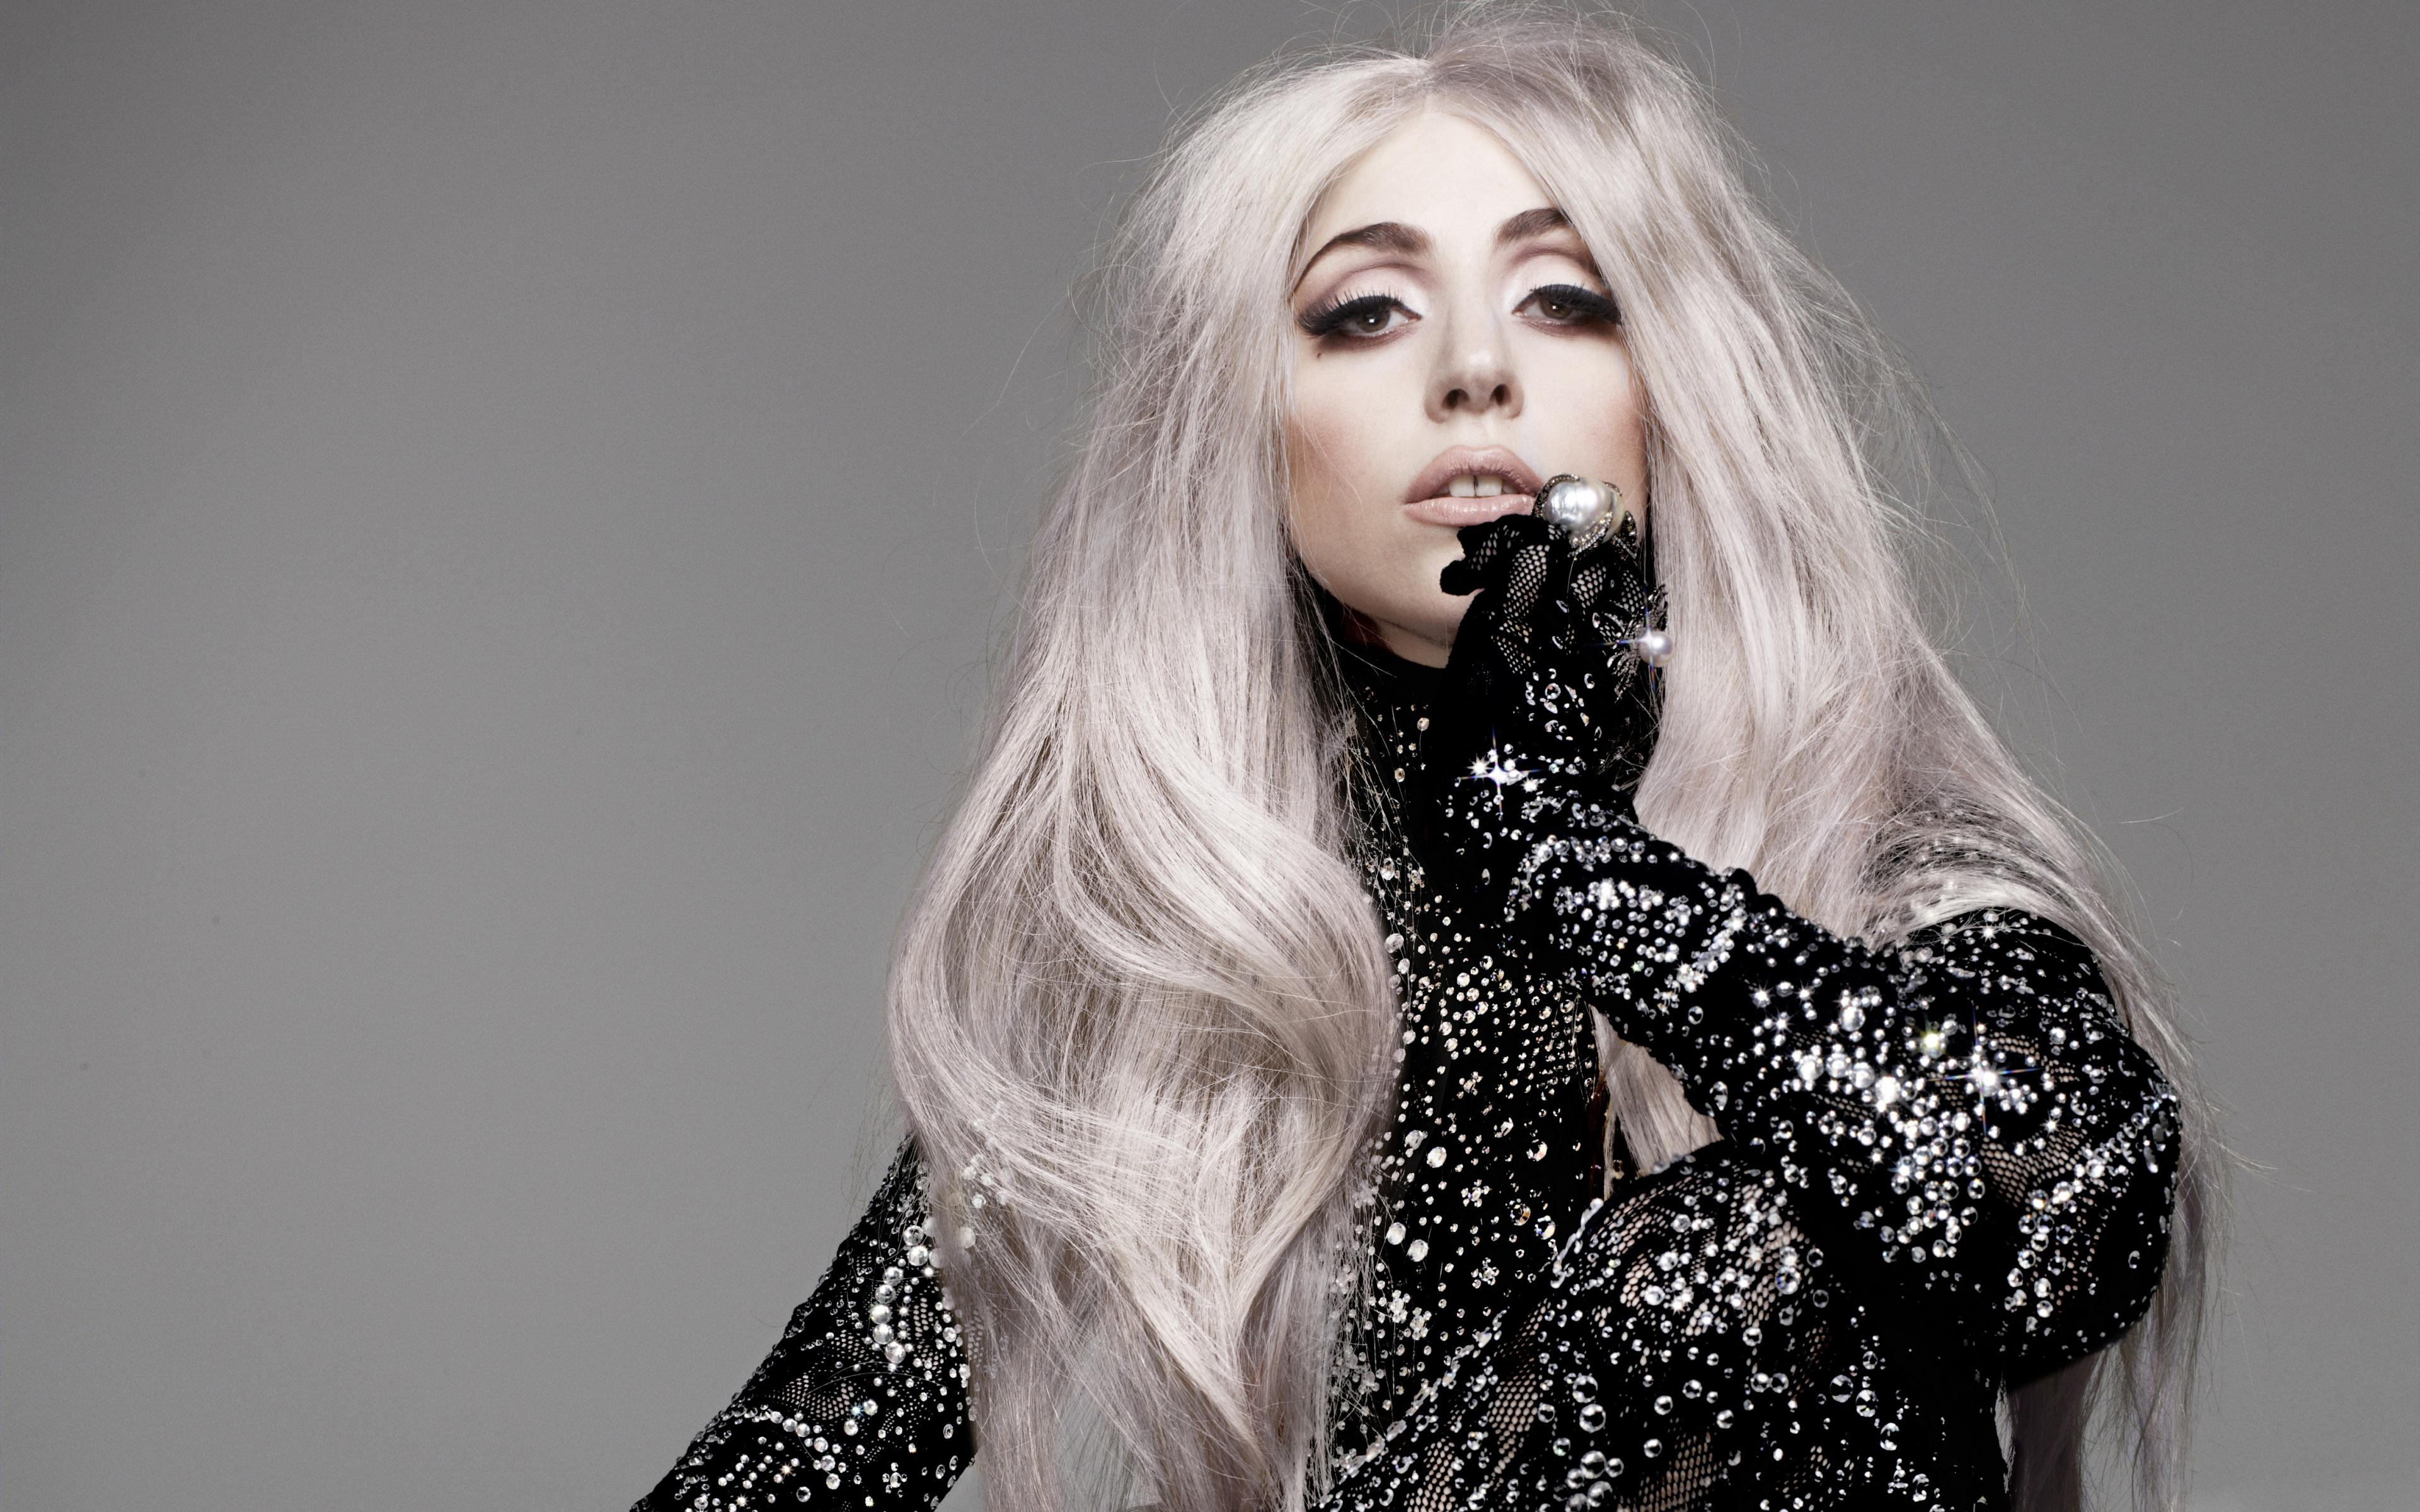 American Lady Gaga Long Hair Singer White Hair 3840x2400